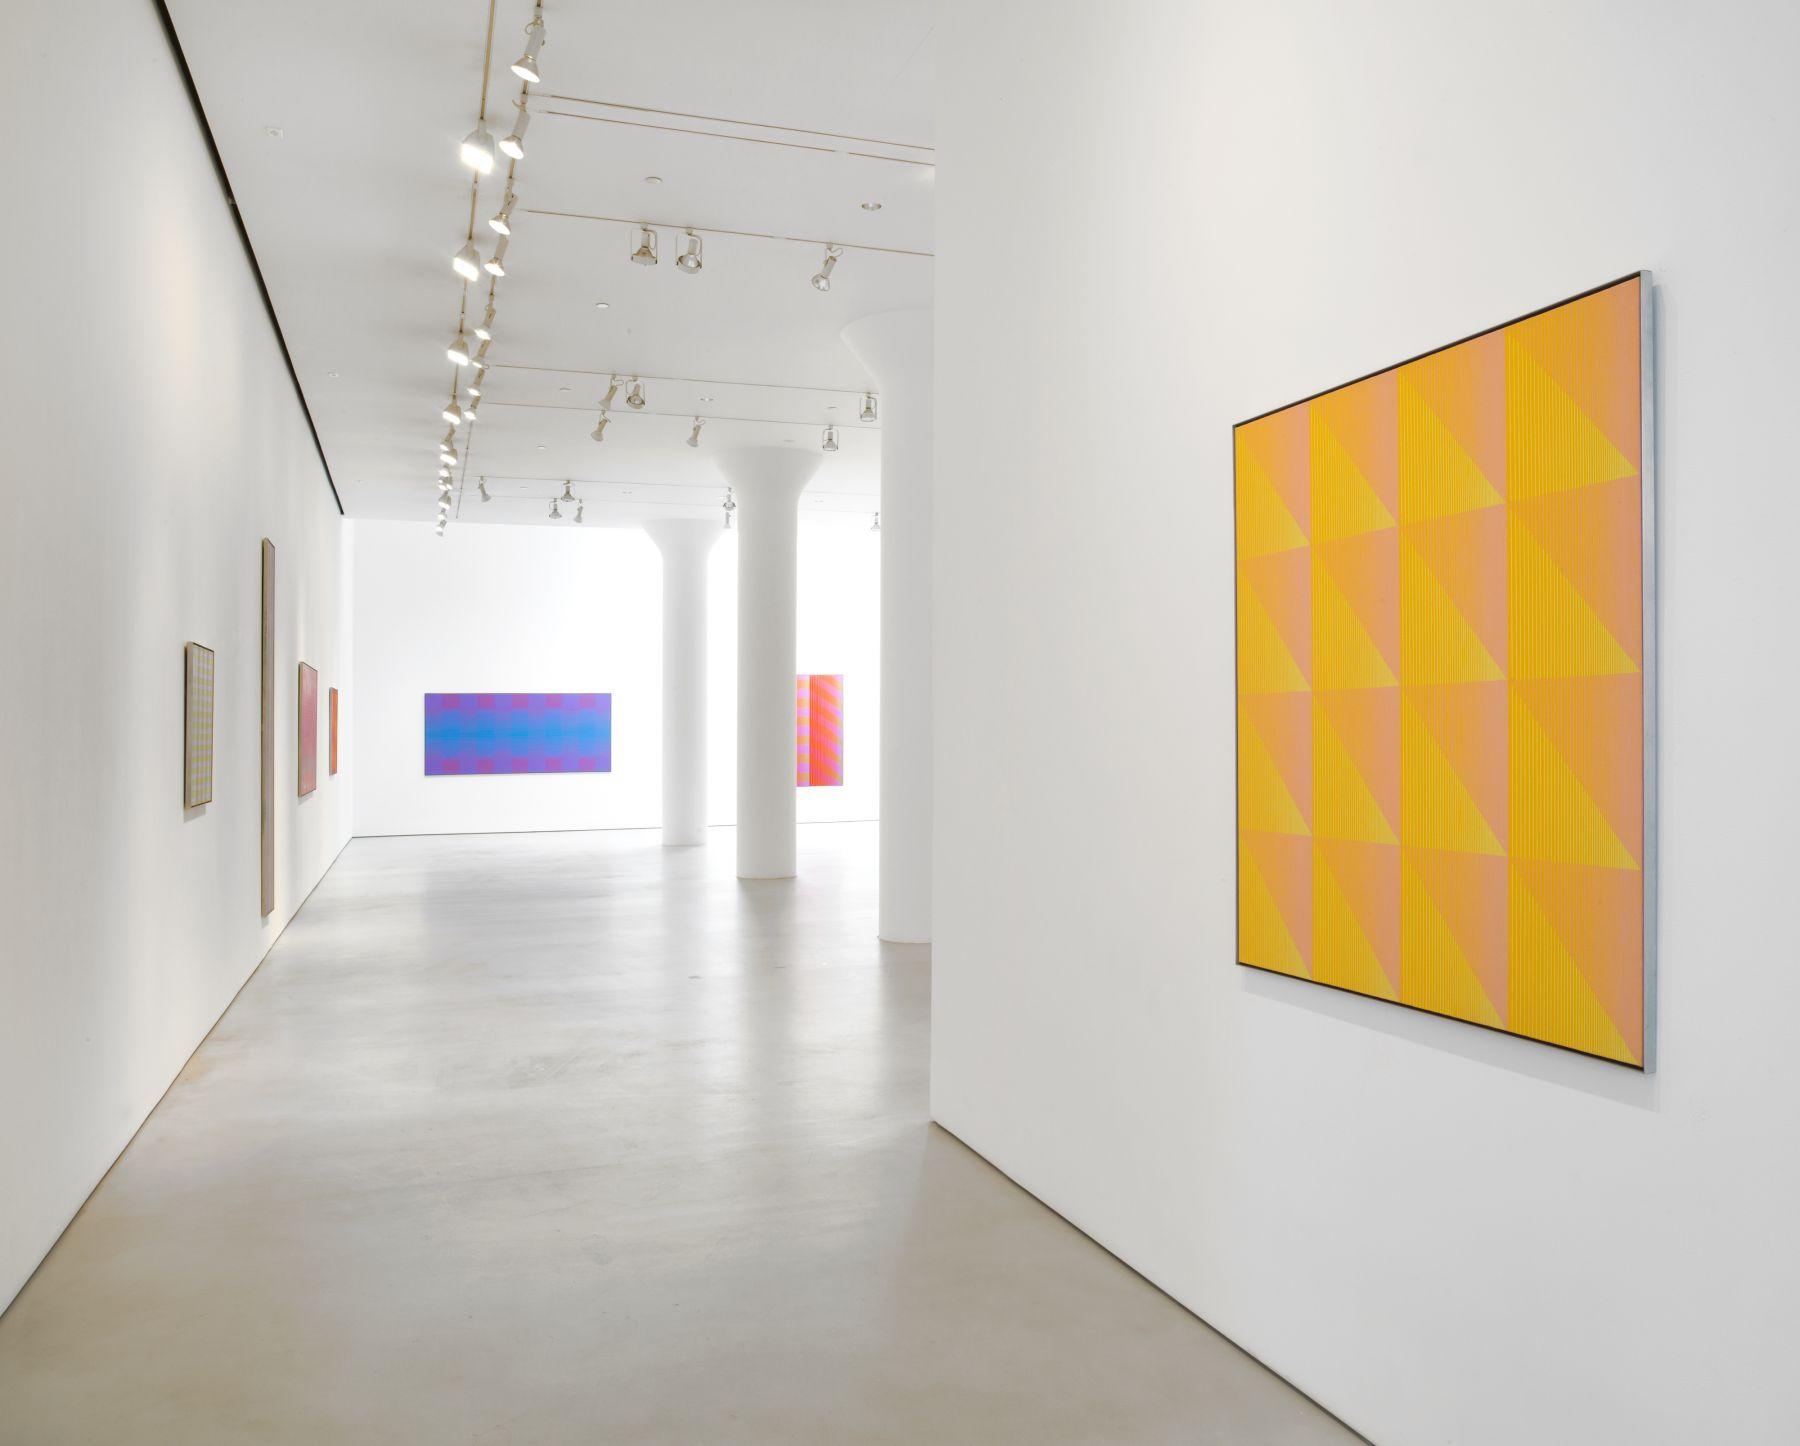 JULIAN STANCZAKThe Life of the Surface, Paintings 1970 – 1975